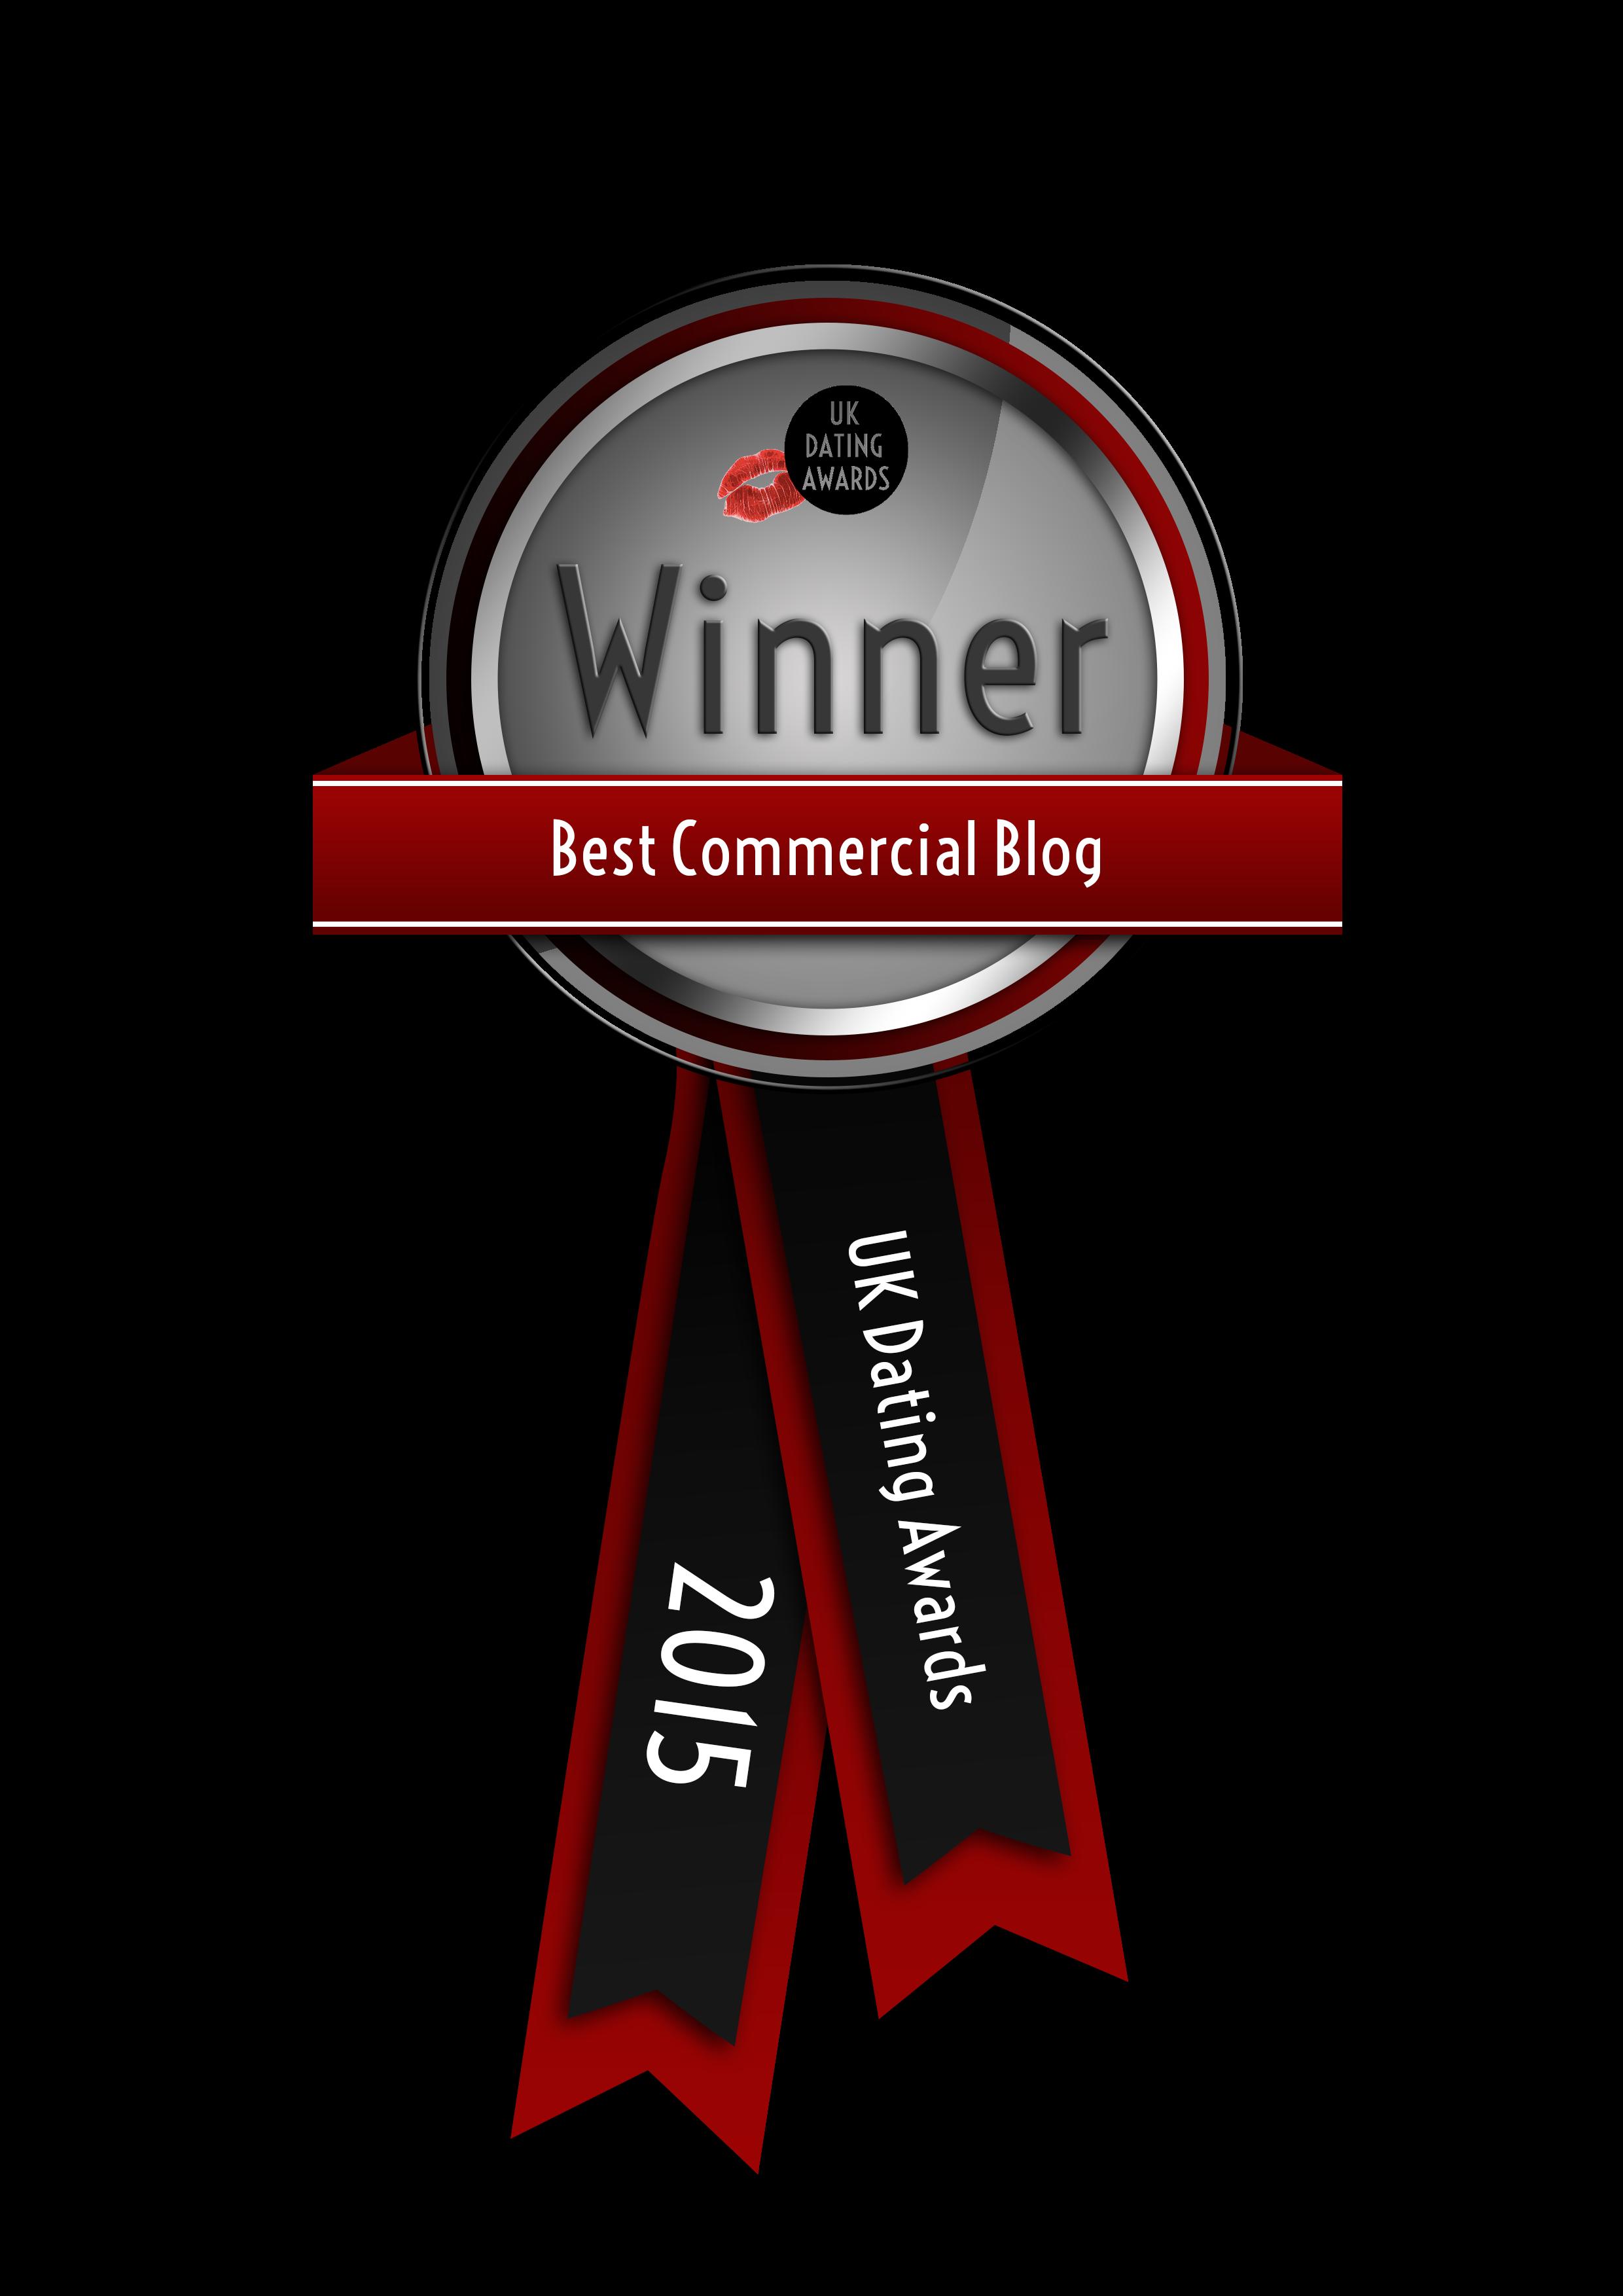 Best commercial blog